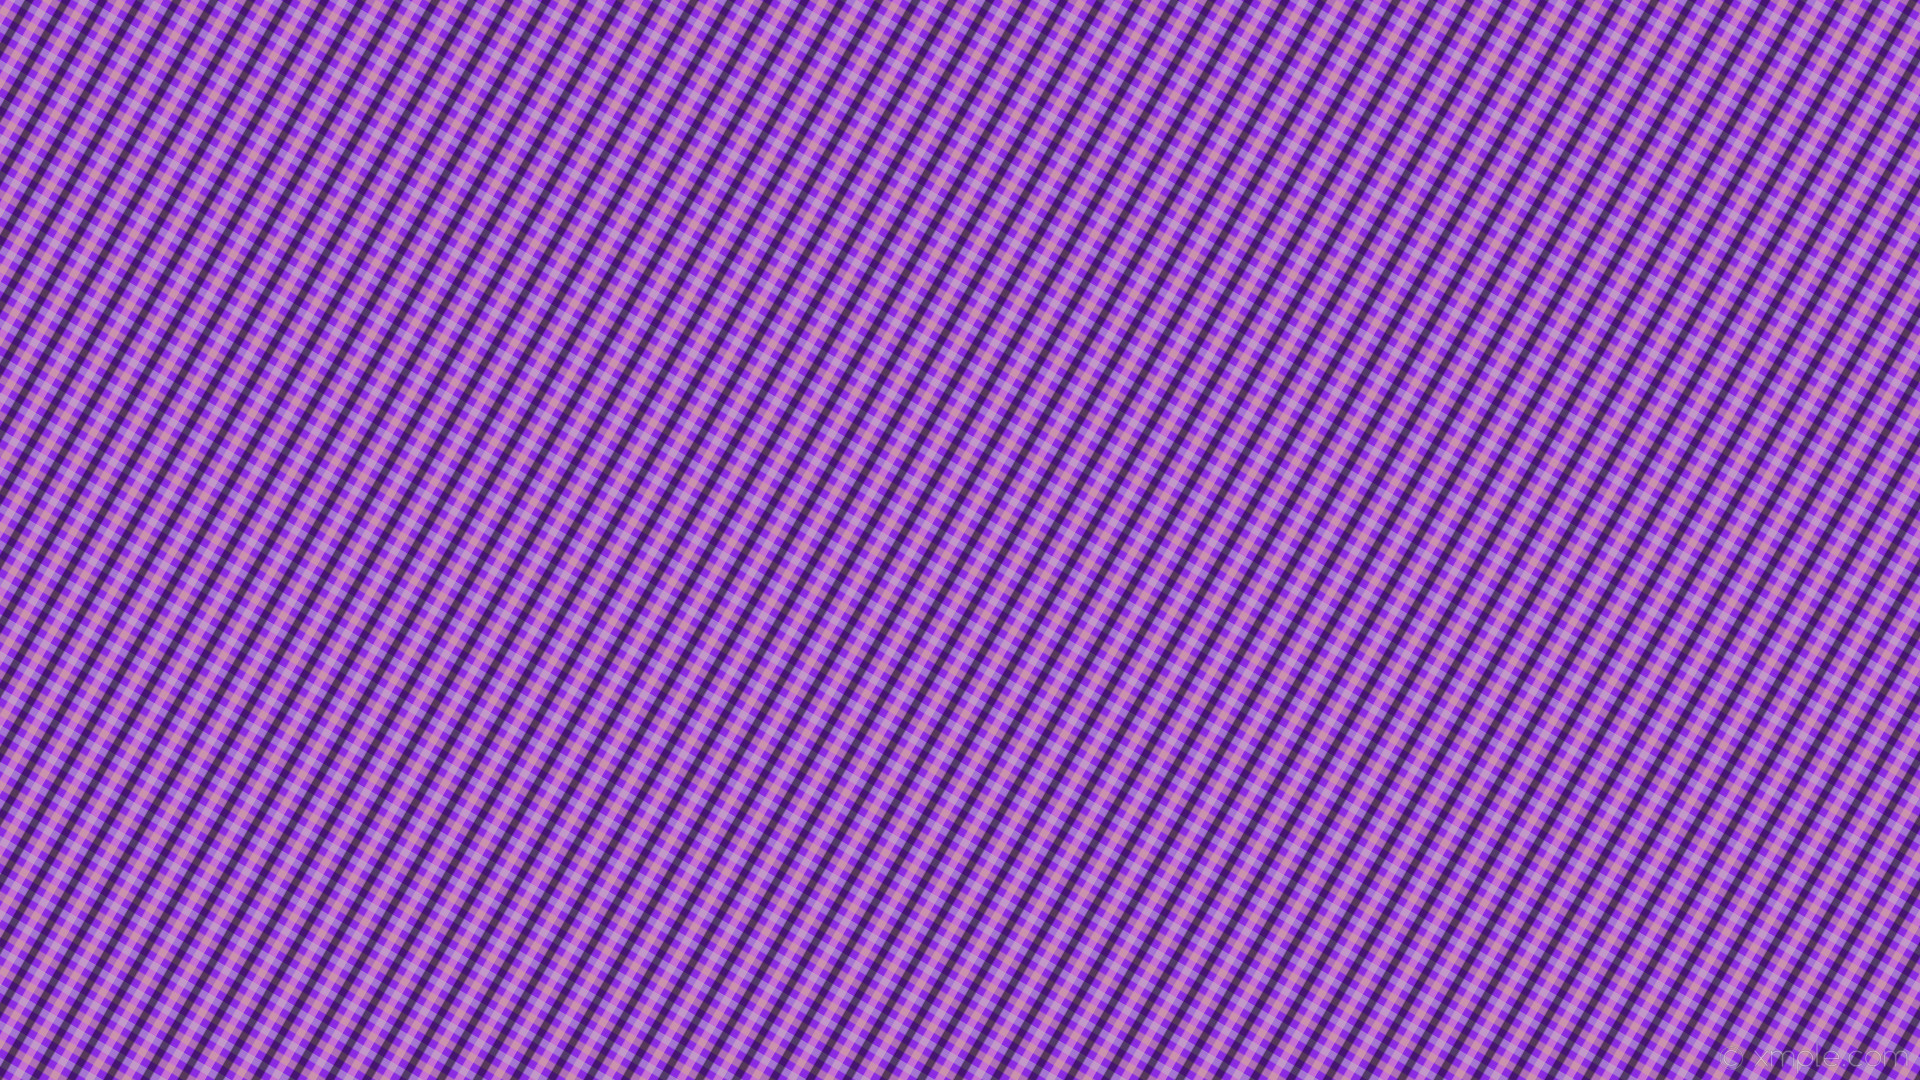 wallpaper purple brown striped gingham pink black grey penta blue violet  light pink silver tan #